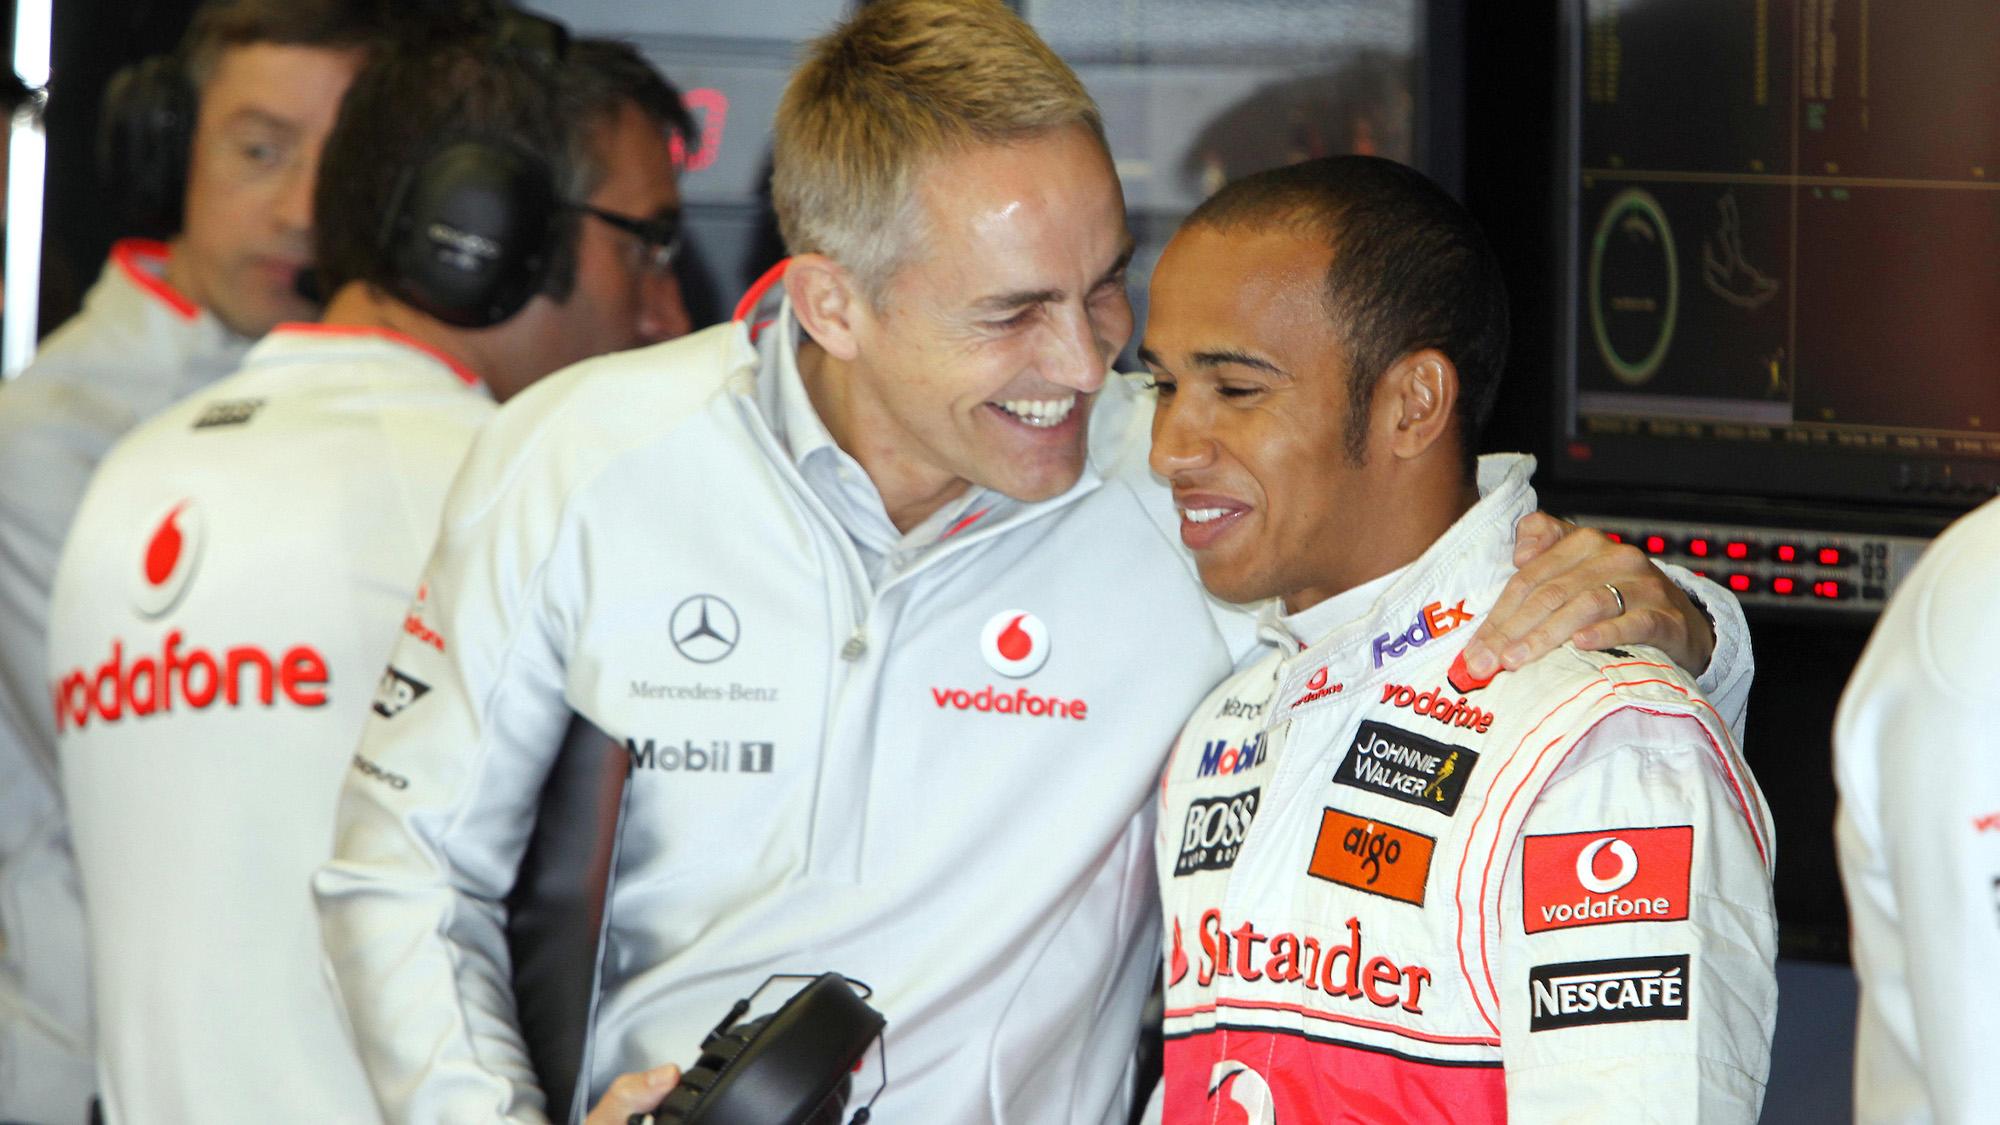 Martin Whitmarsh with Lewis Hamilton in 2009